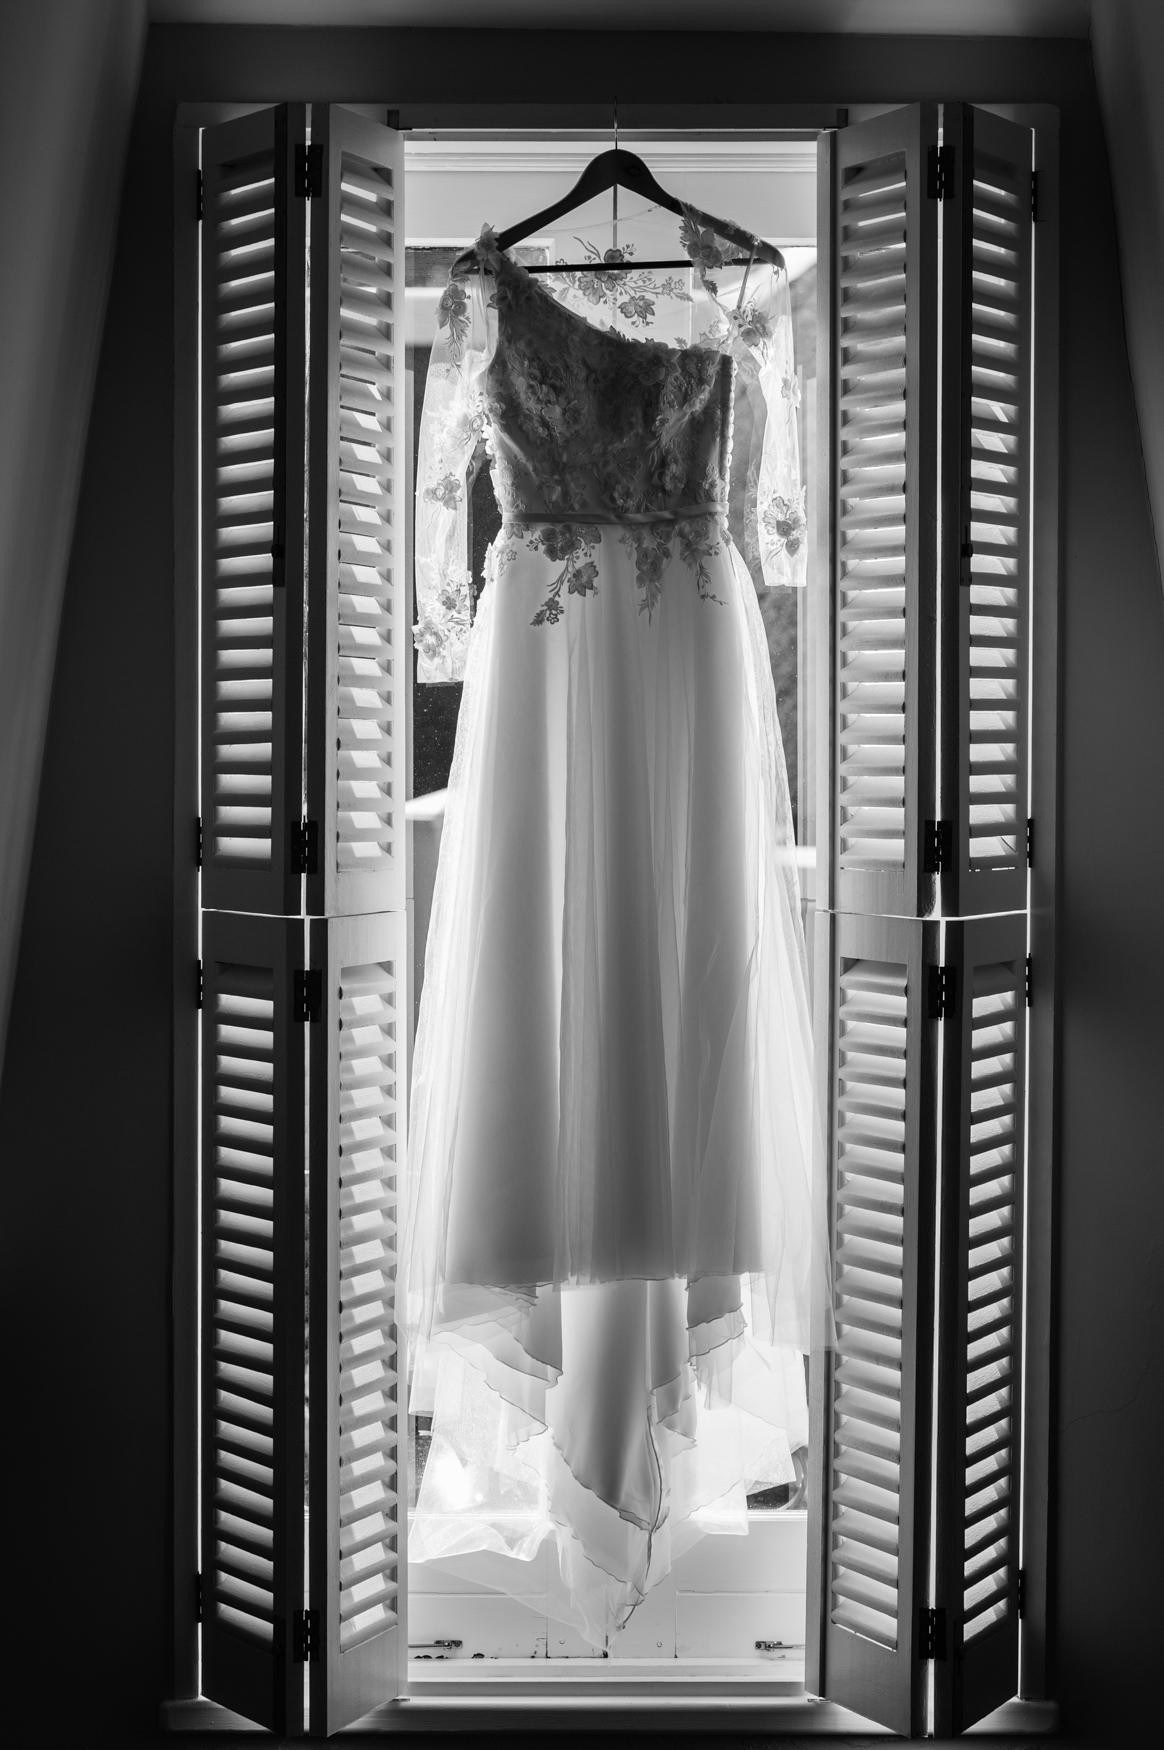 Leon_&_Martine's_Wedding_Photographs_17th_April_2019_@johnhenryweddingphoto_Low_Resolution_Web-061.JPG